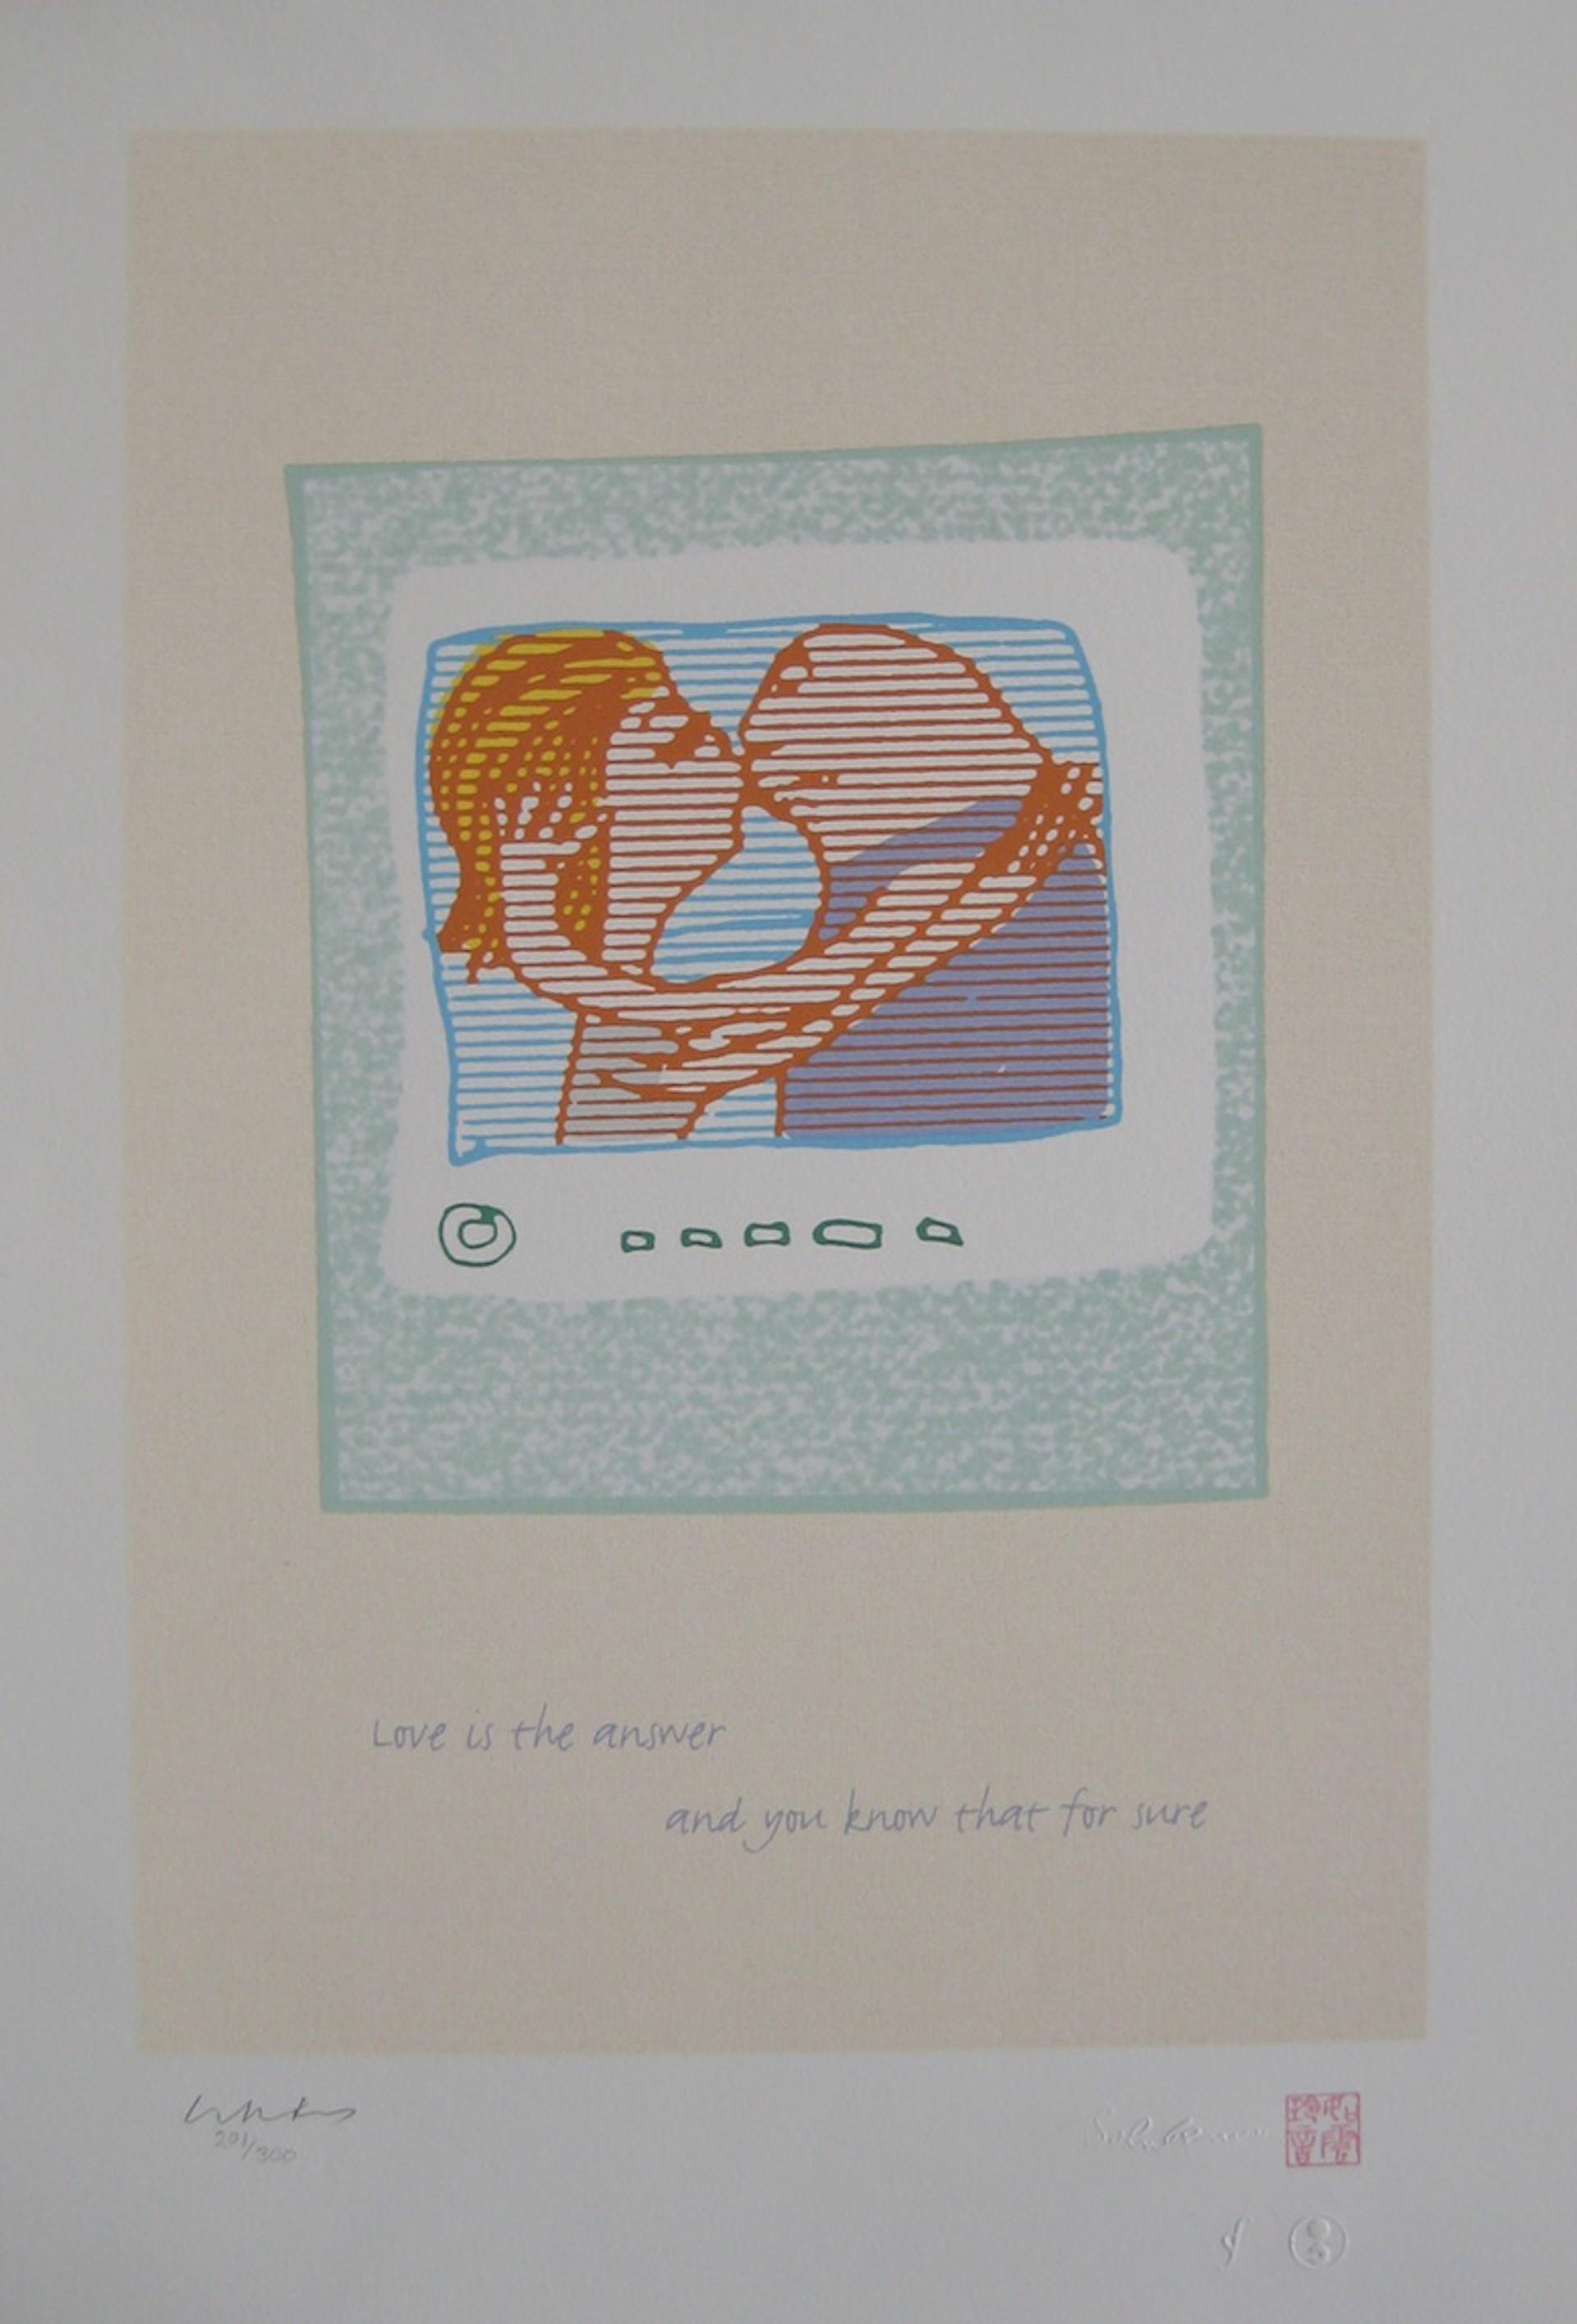 """Love Is The Answer"" by John Lennon"